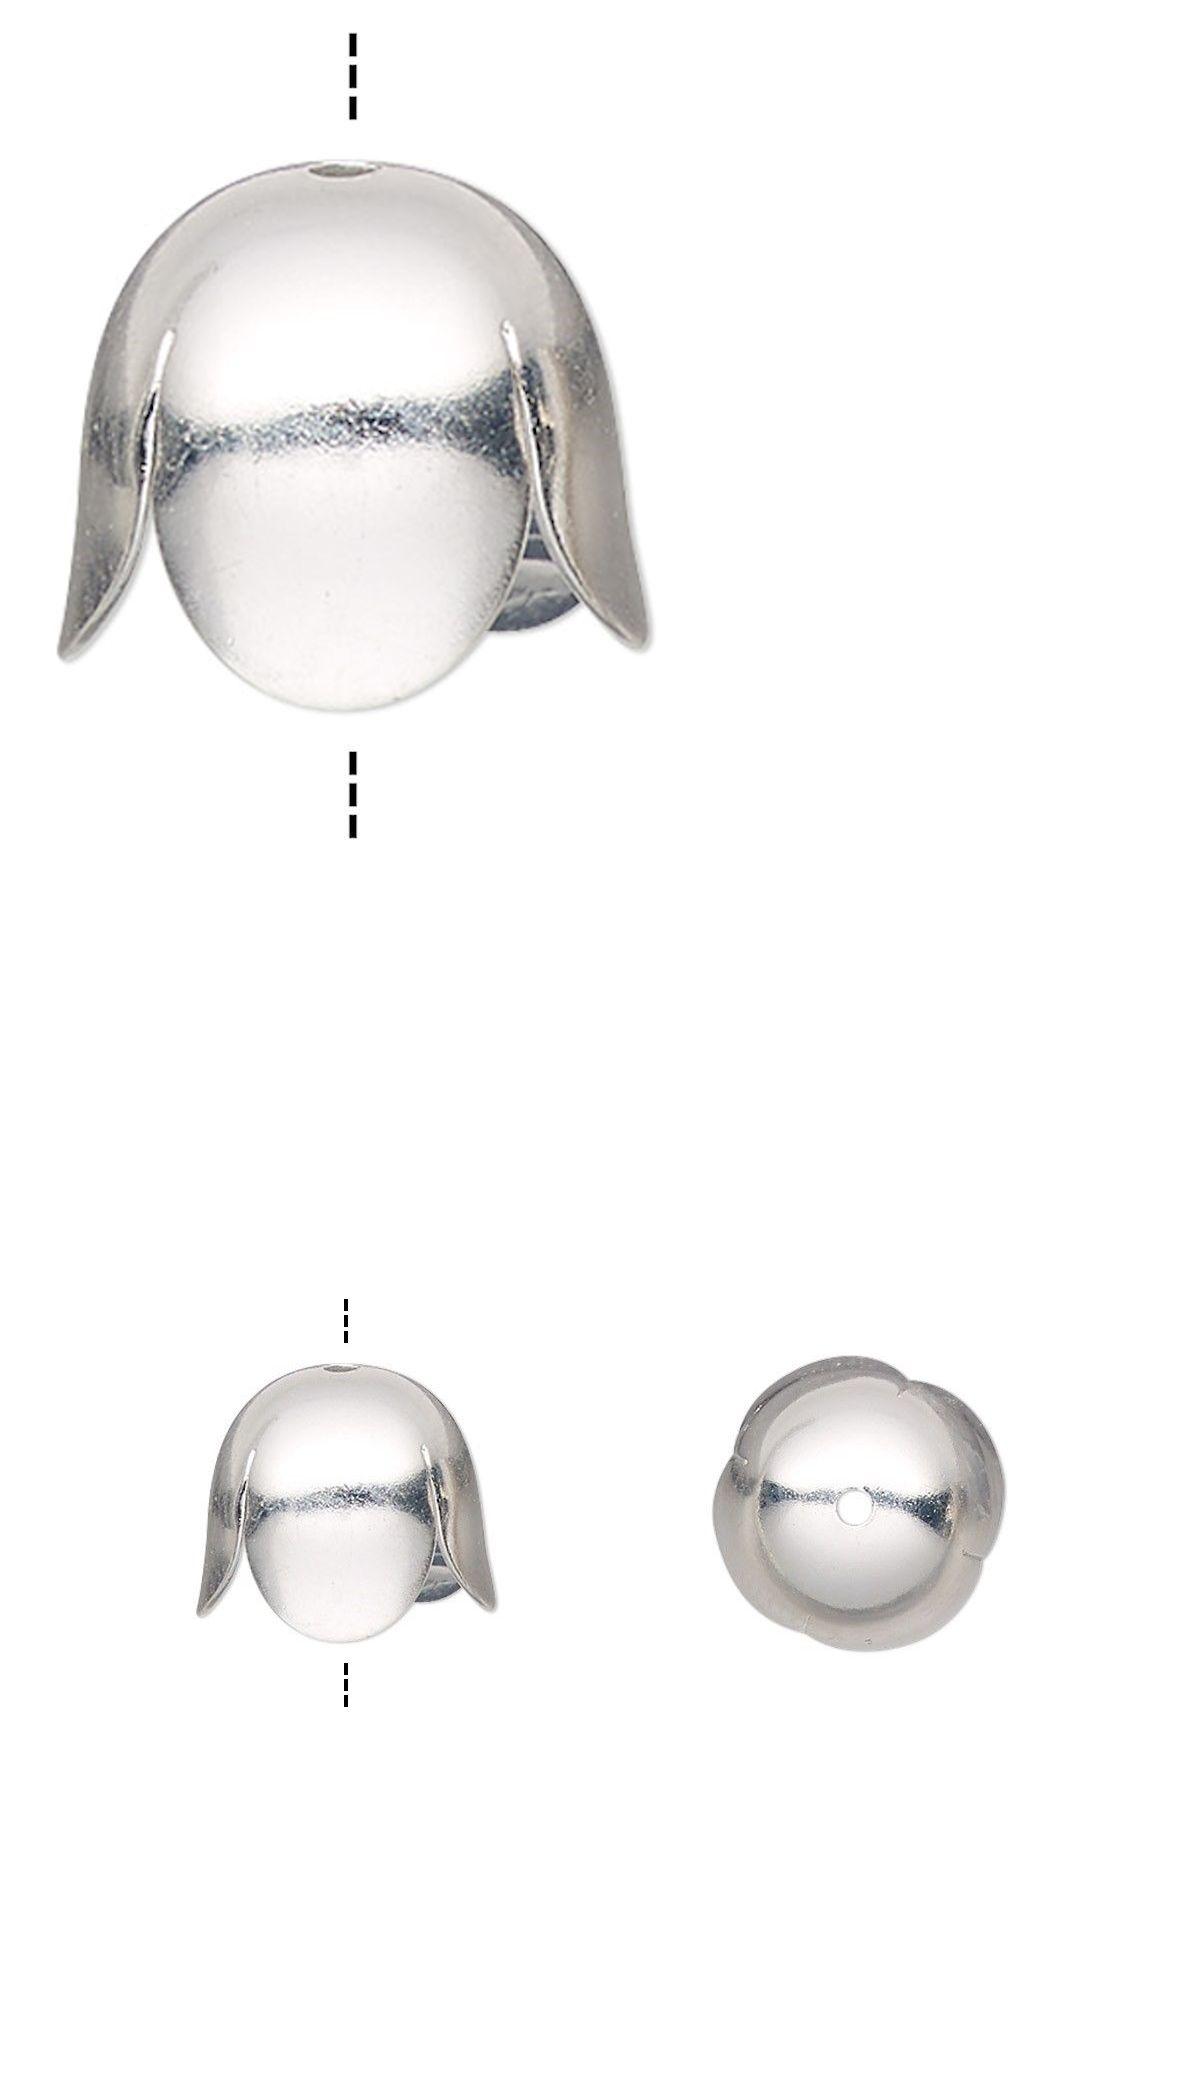 10 crimps silver matte 8 mm  crimp ends